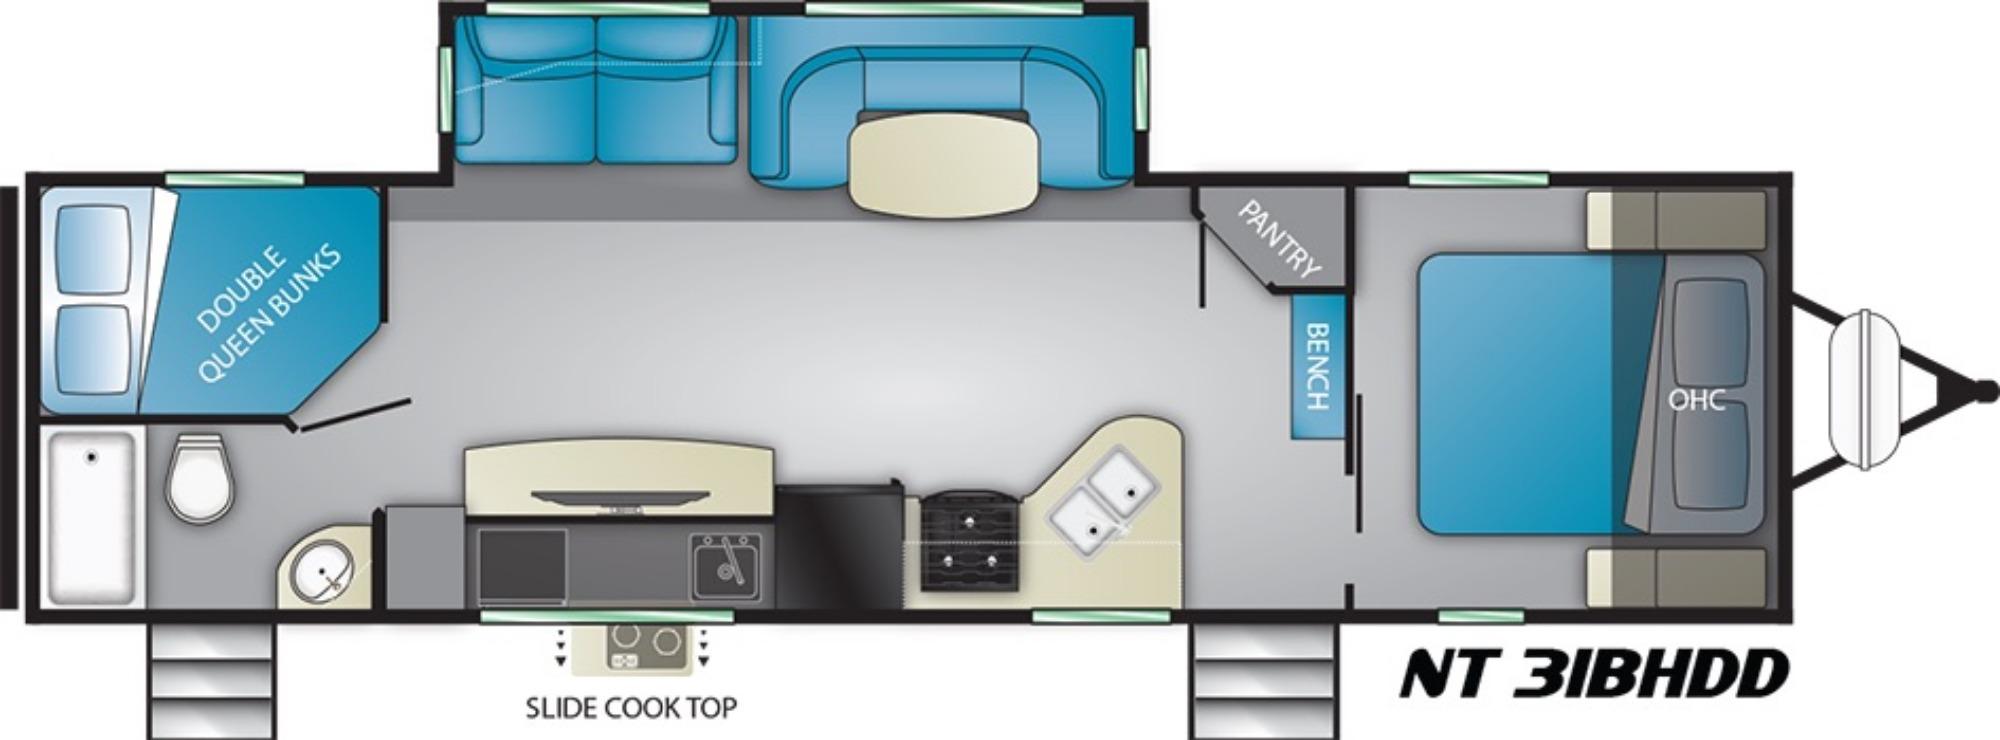 View Floor Plan for 2019 HEARTLAND NORTH TRAIL 31BHDD